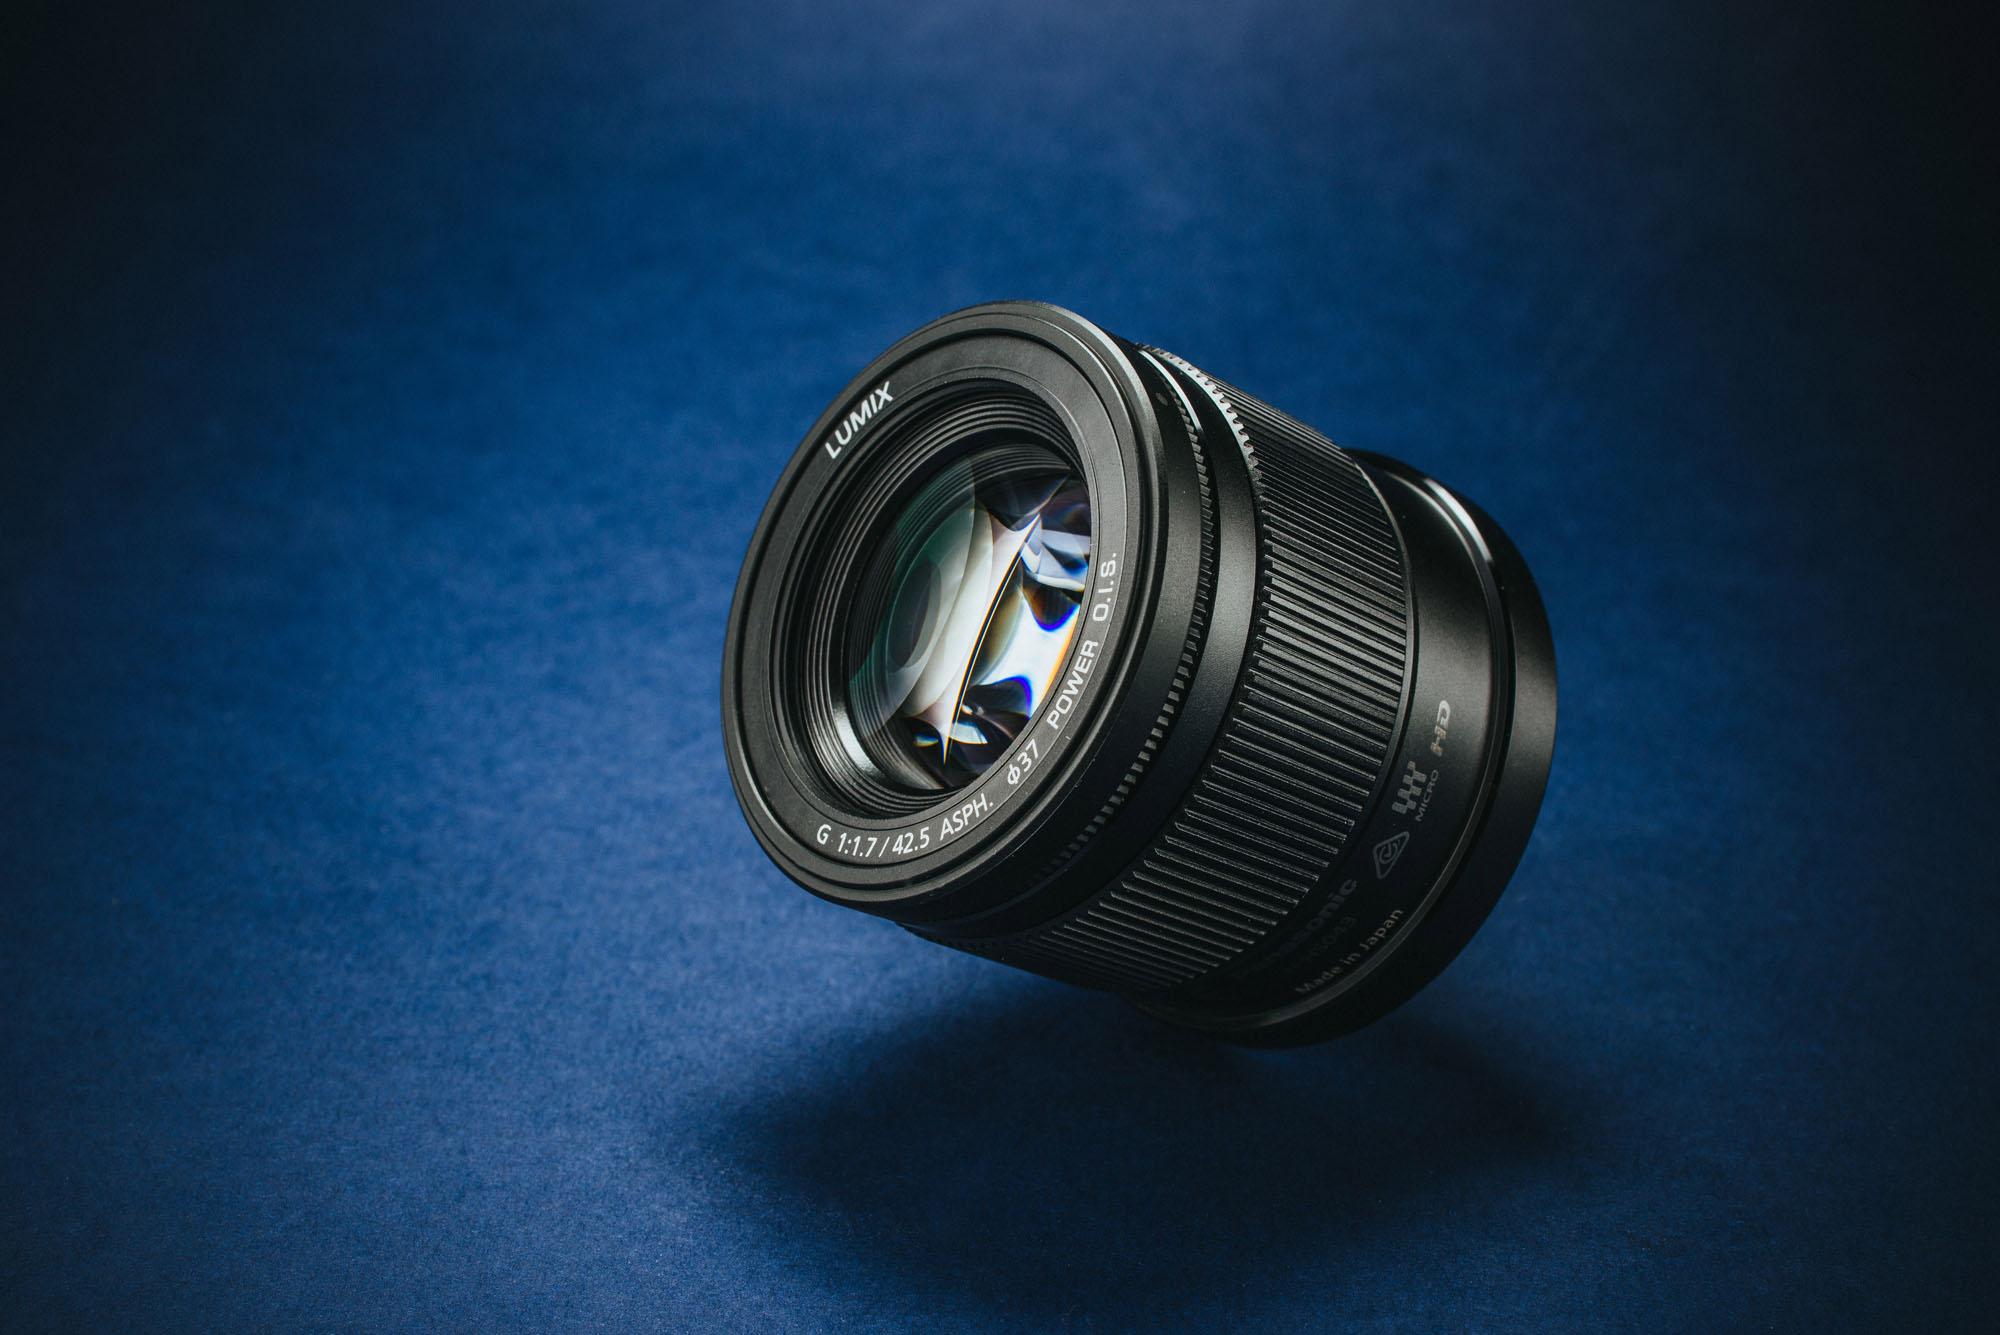 Panasonic_Lumix_42.5mm_f1.7_review_04